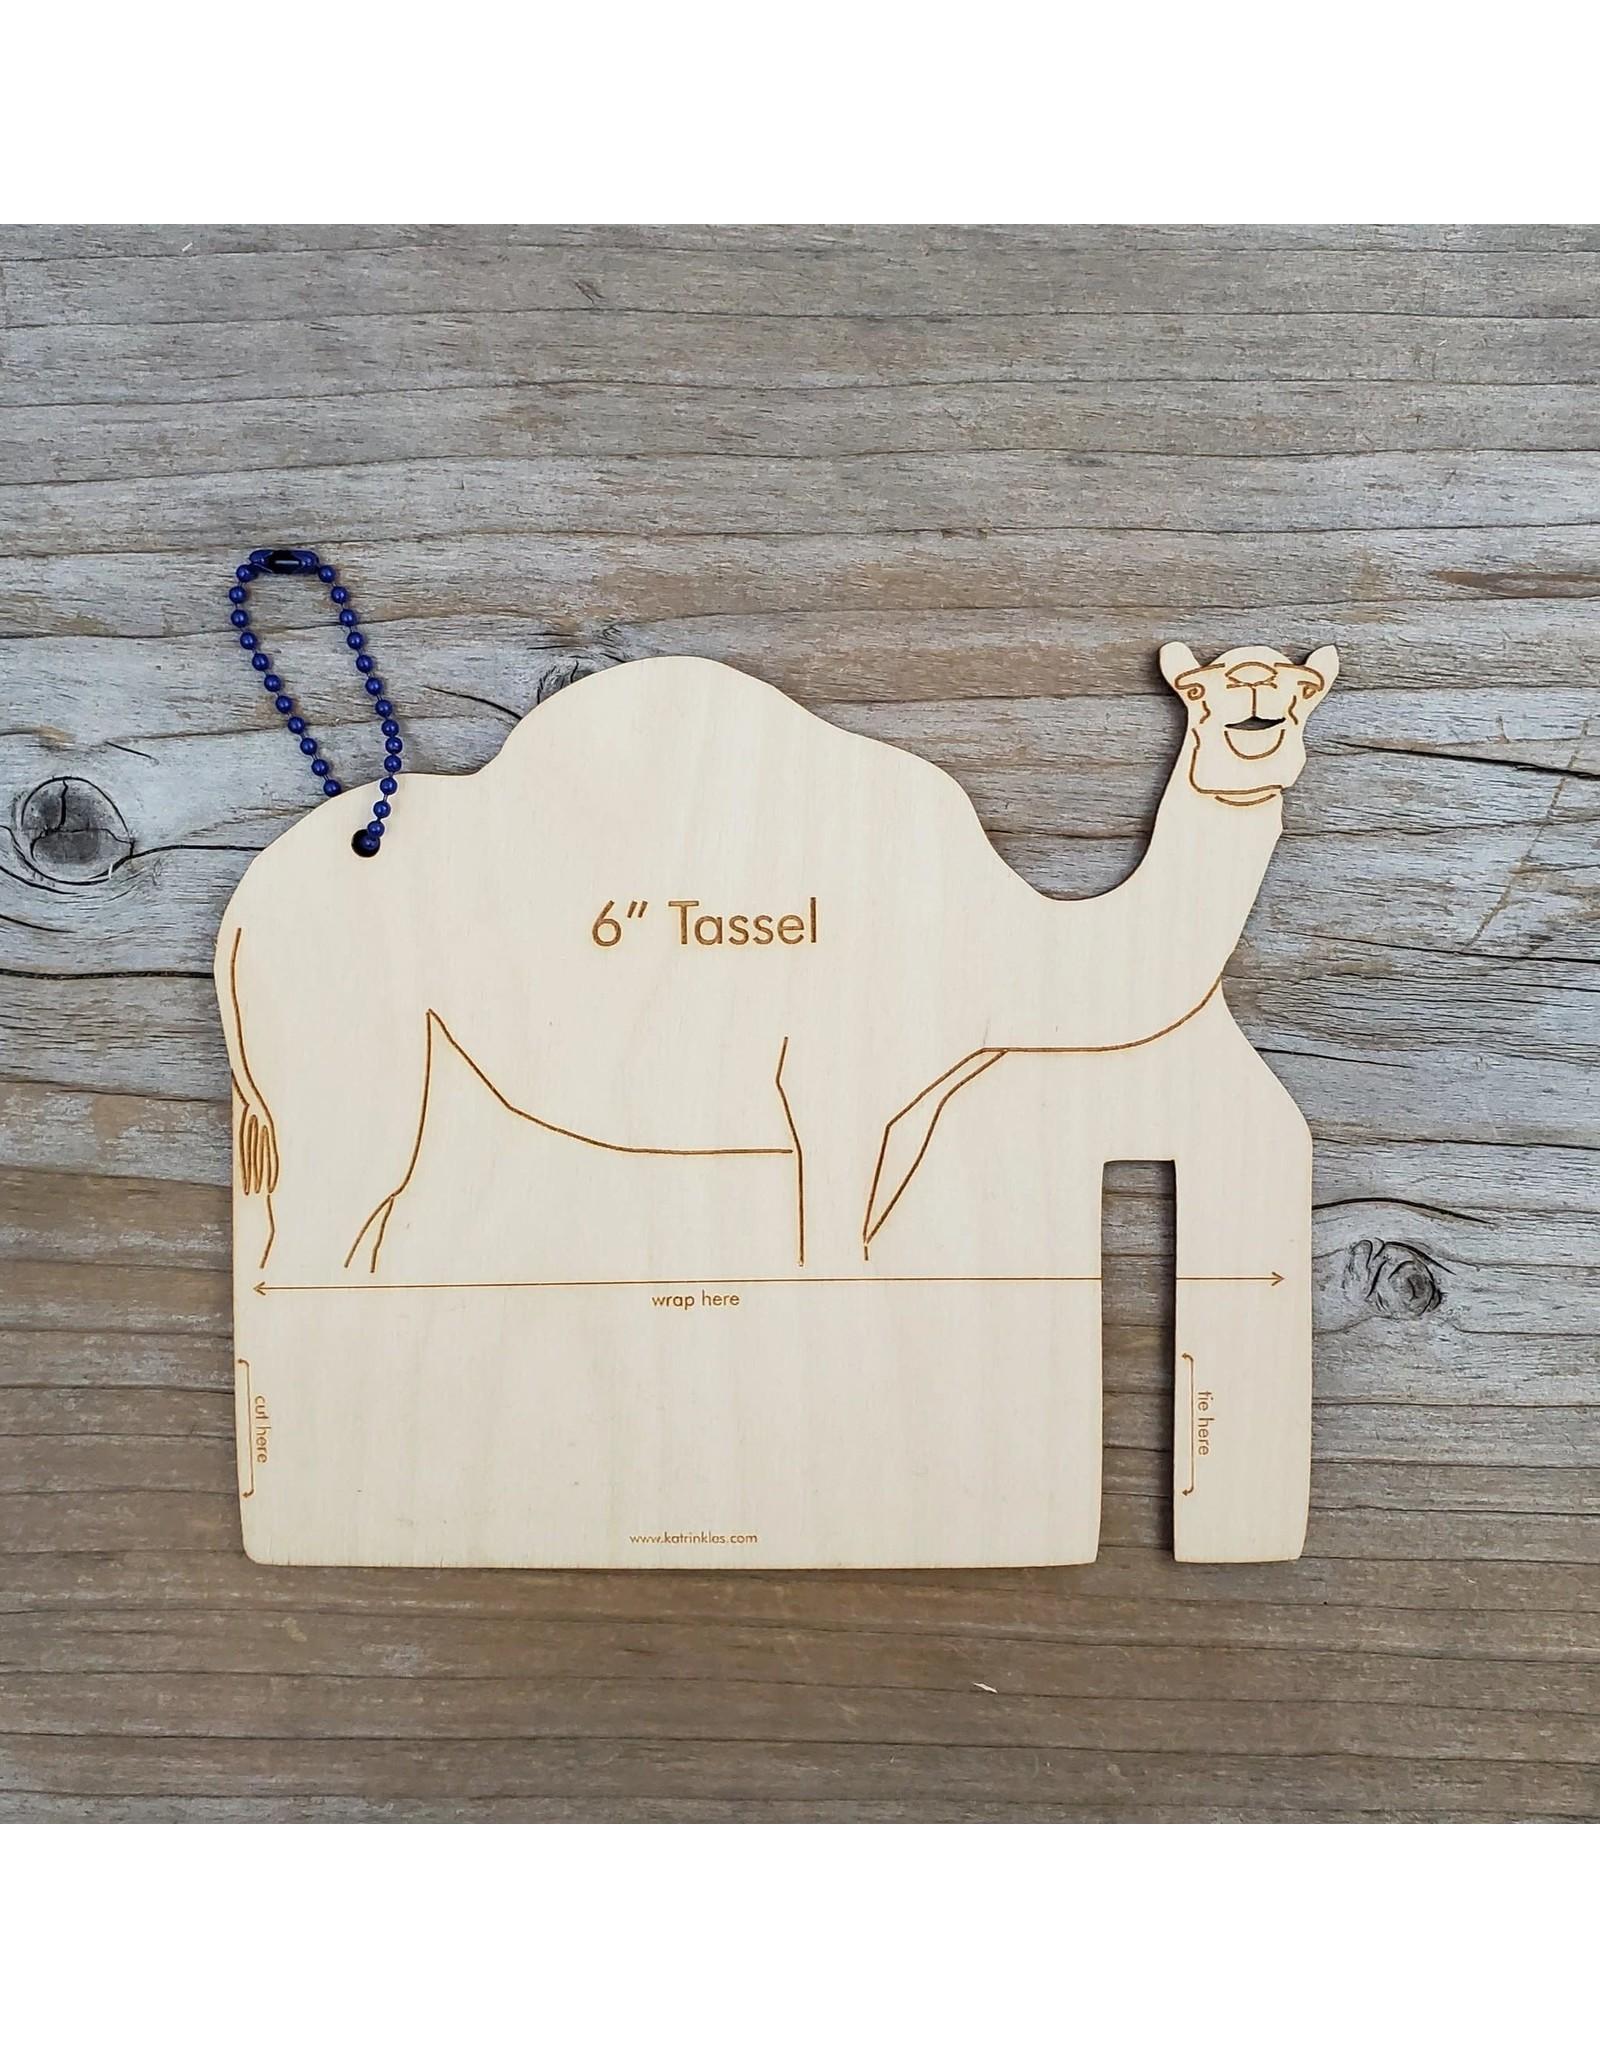 "Fiber Animal Tassel Maker 6"" Camel by Katrinkles"